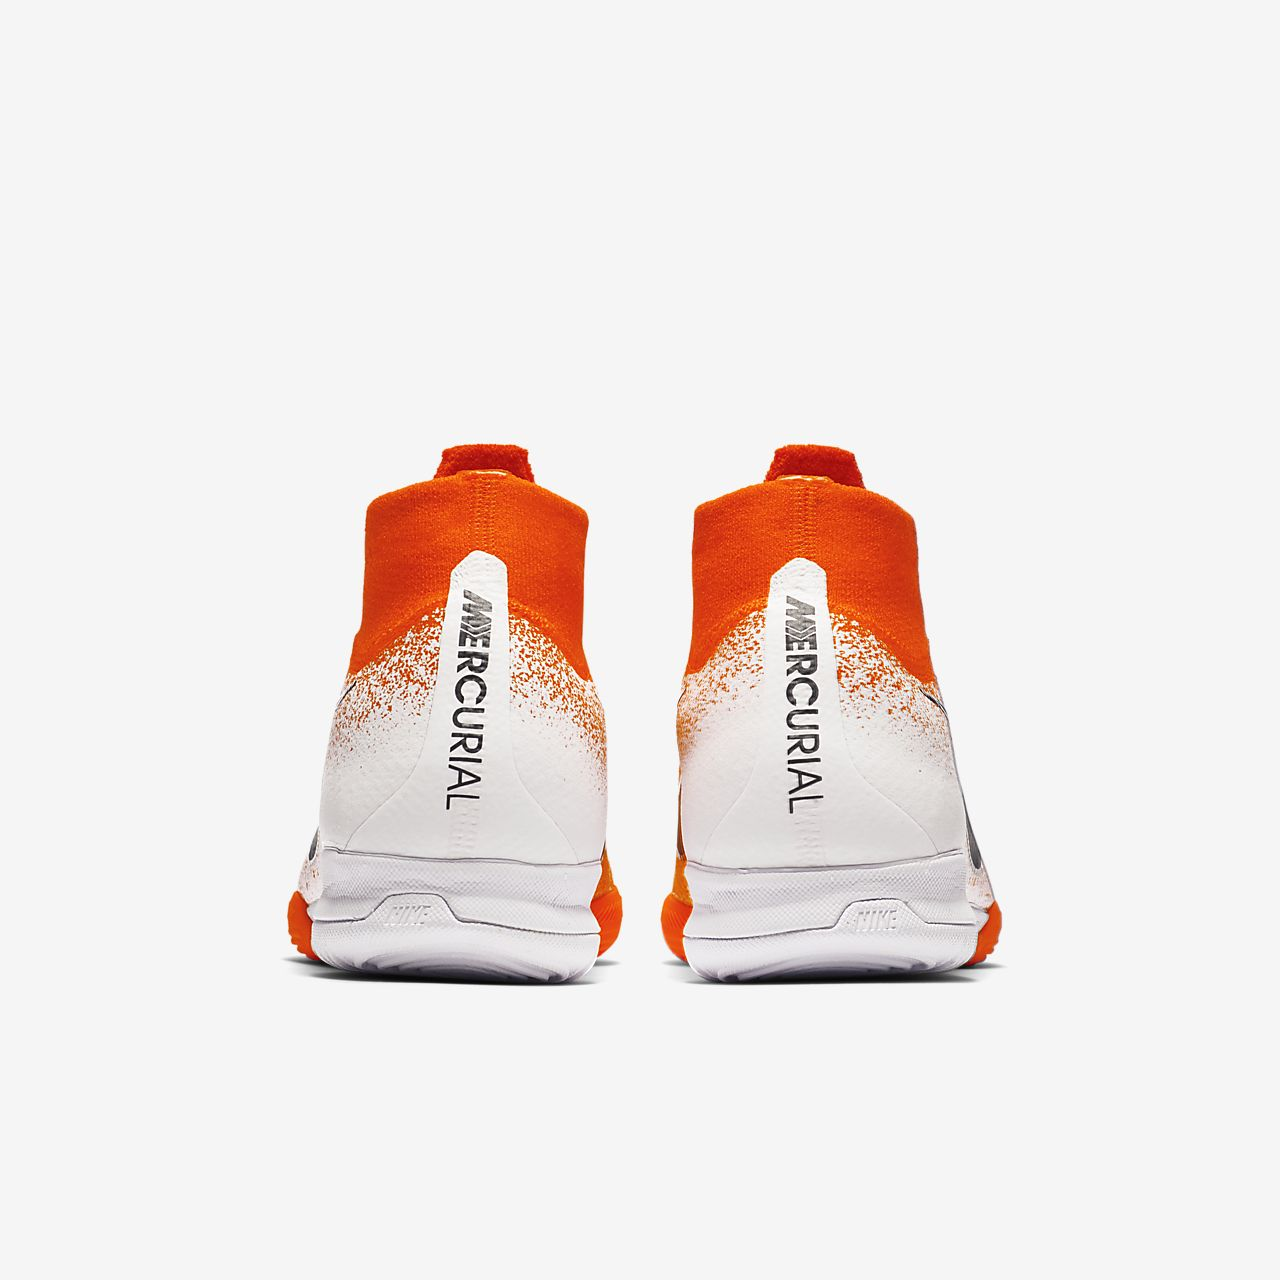 2bb6f886a Nike SuperflyX 6 Elite IC Men s Indoor Court Football Boot. Nike.com AU